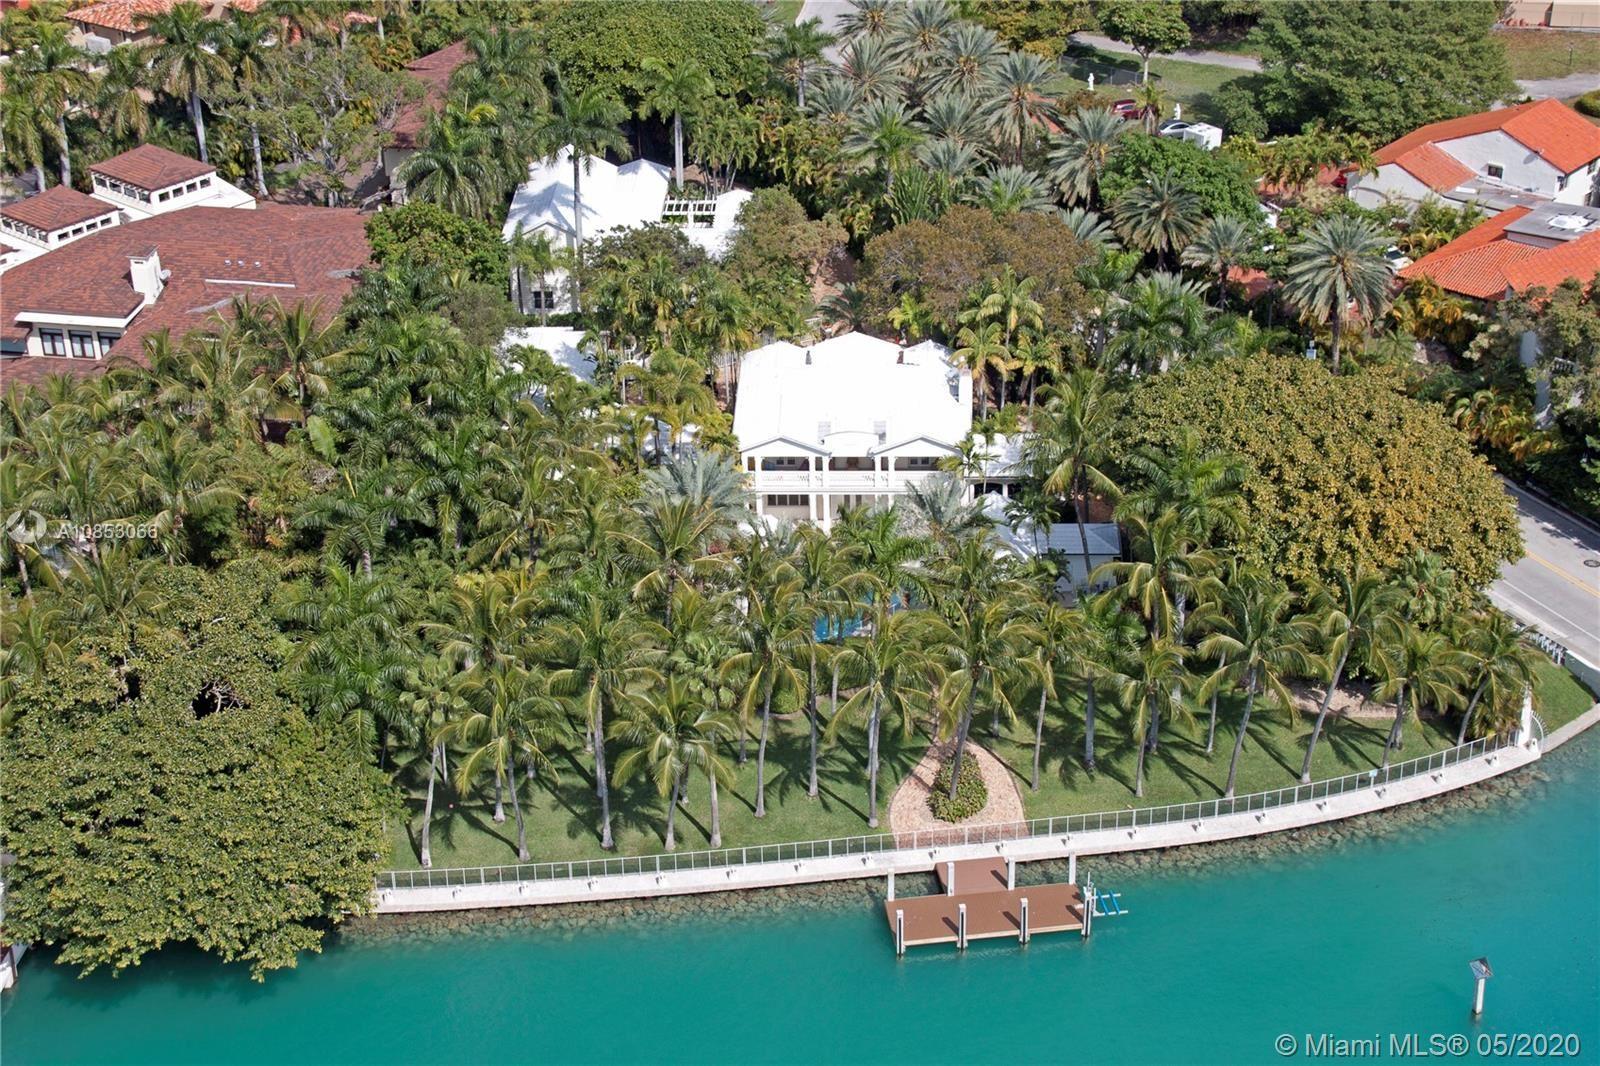 Photo 26 of Listing MLS a10853066 in 1 Star Island Dr Miami Beach FL 33139